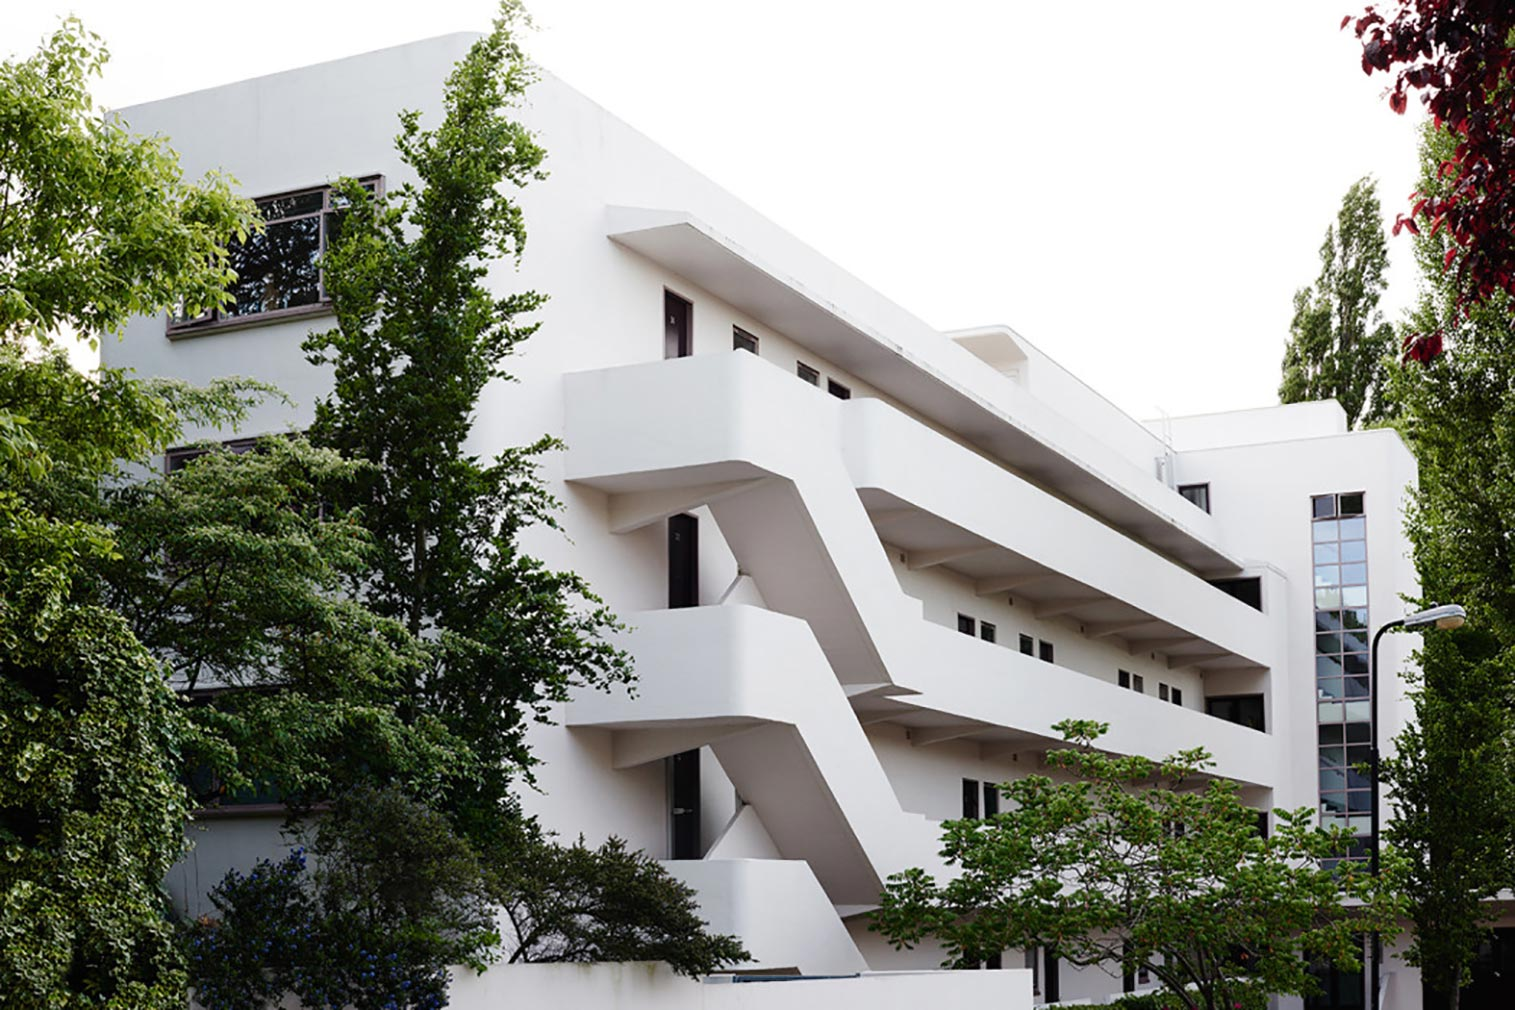 isokon-building-in-london-baker-photography-1050x700